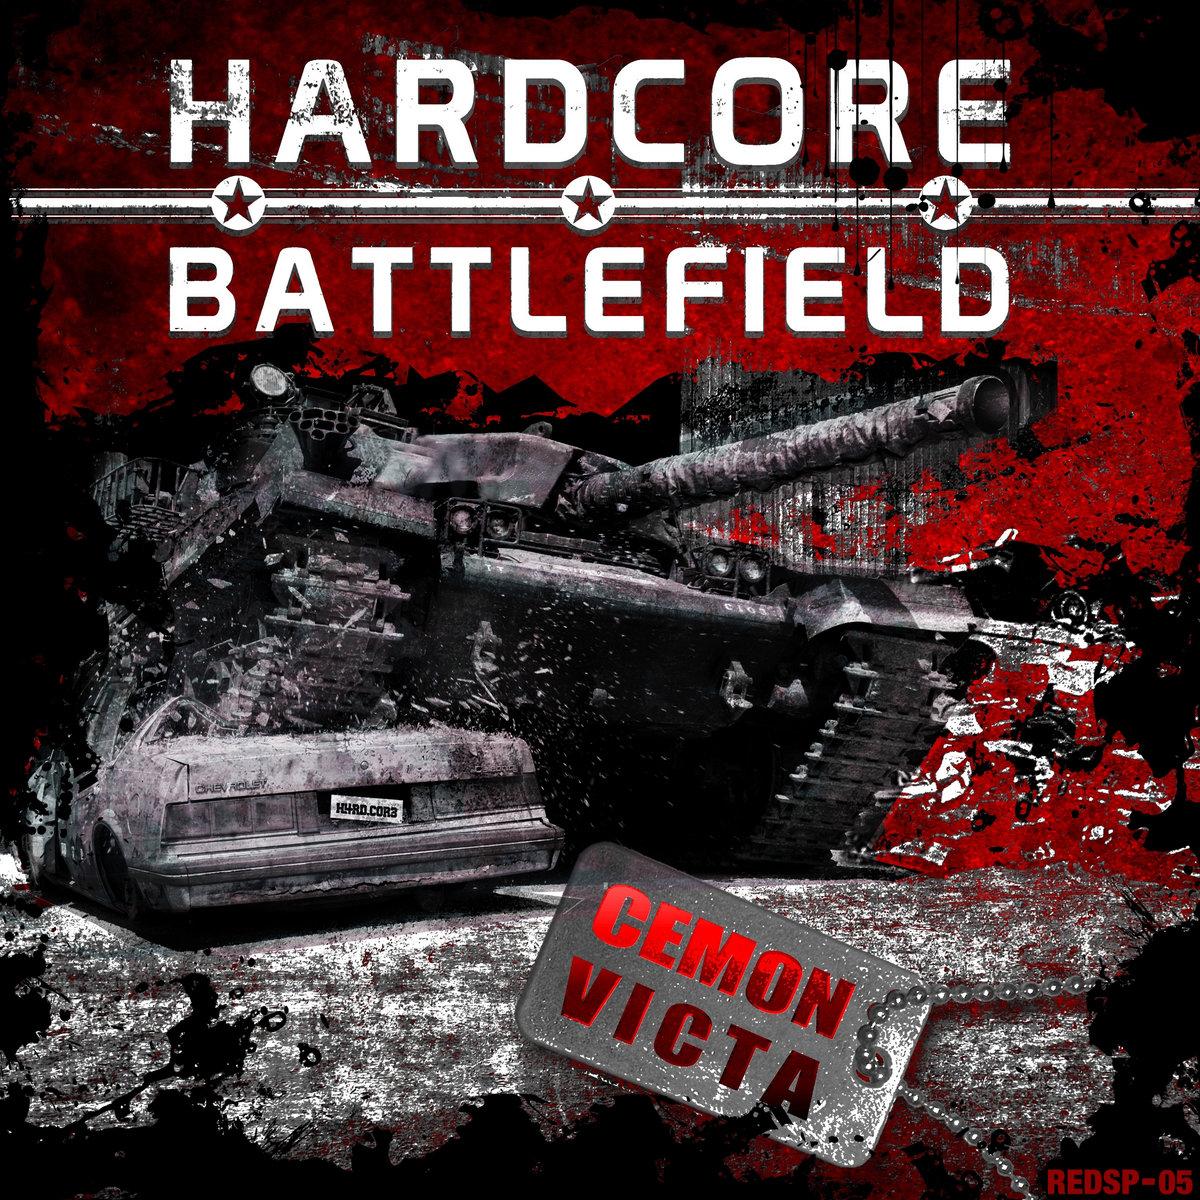 Cemon Victa - Hardcore Battlefield @ 'Hardcore Battlefield' album (electronic, cemon victa)